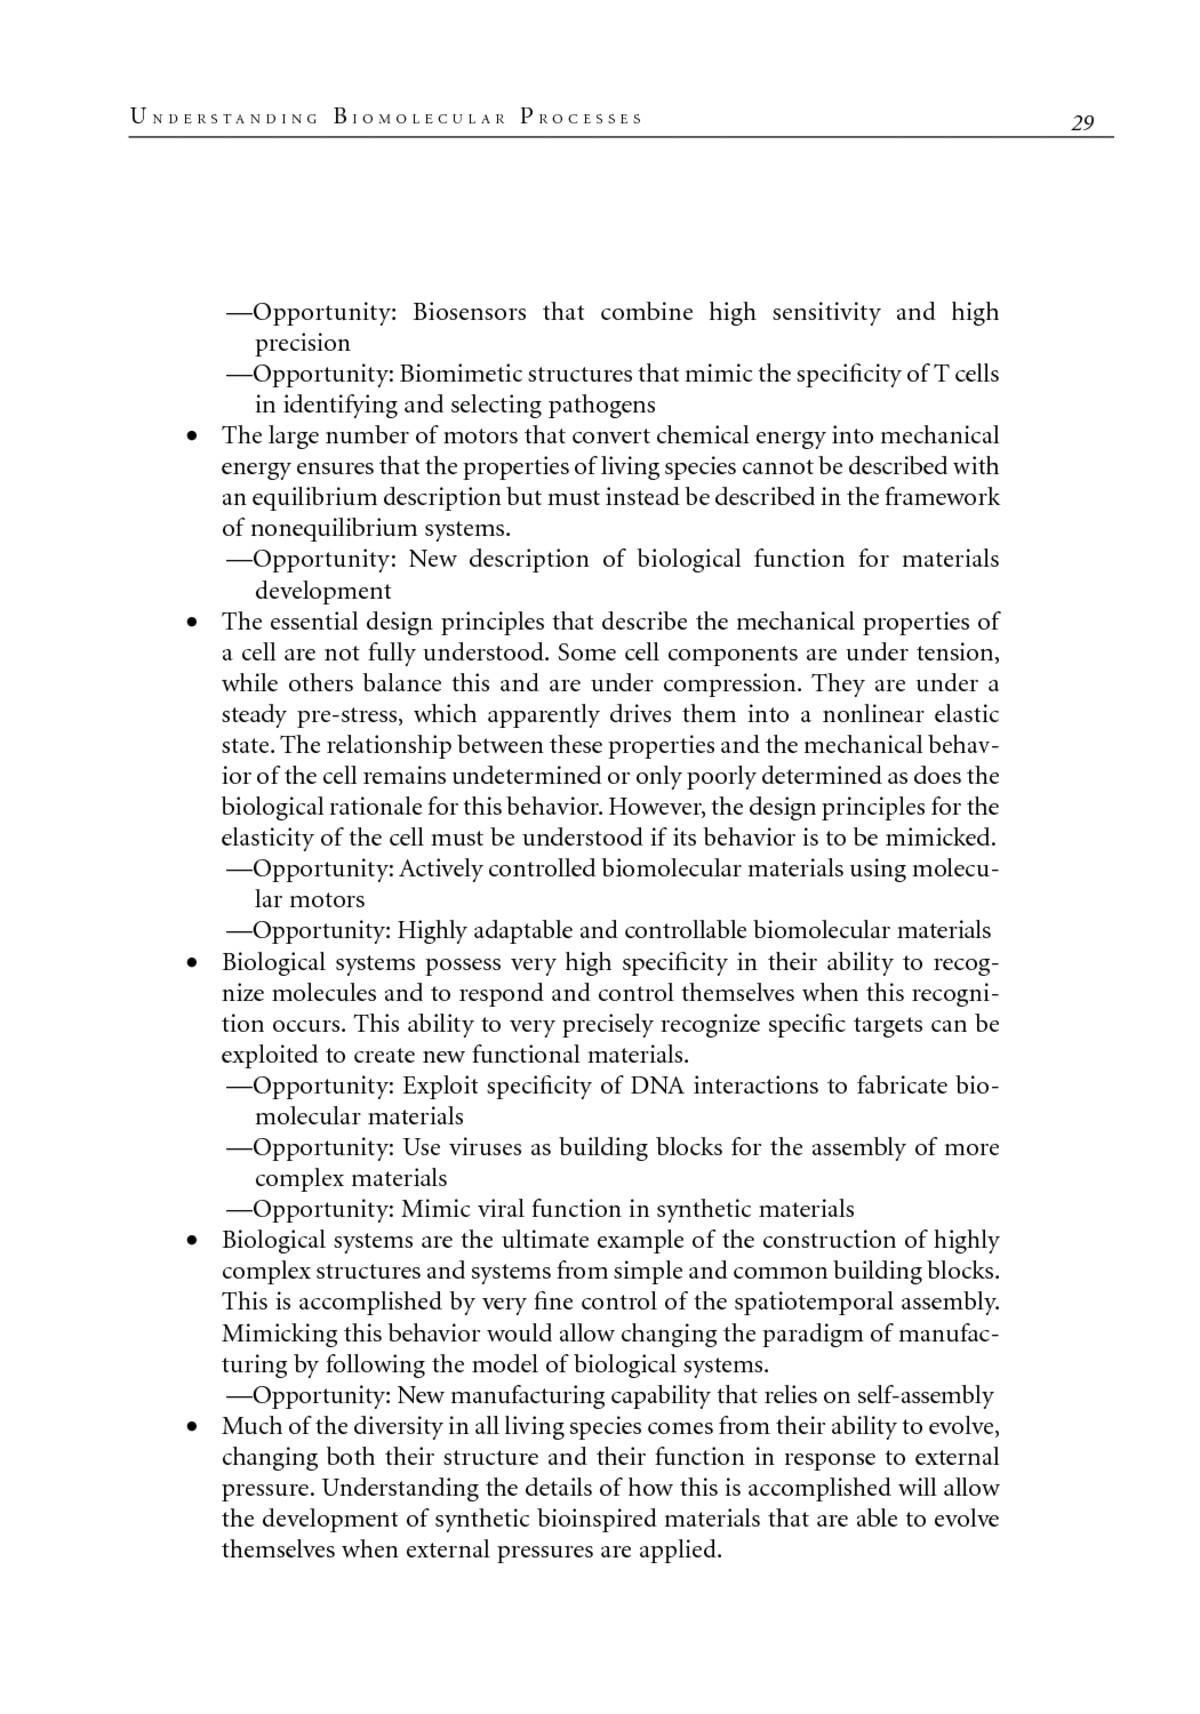 icam investigation report template